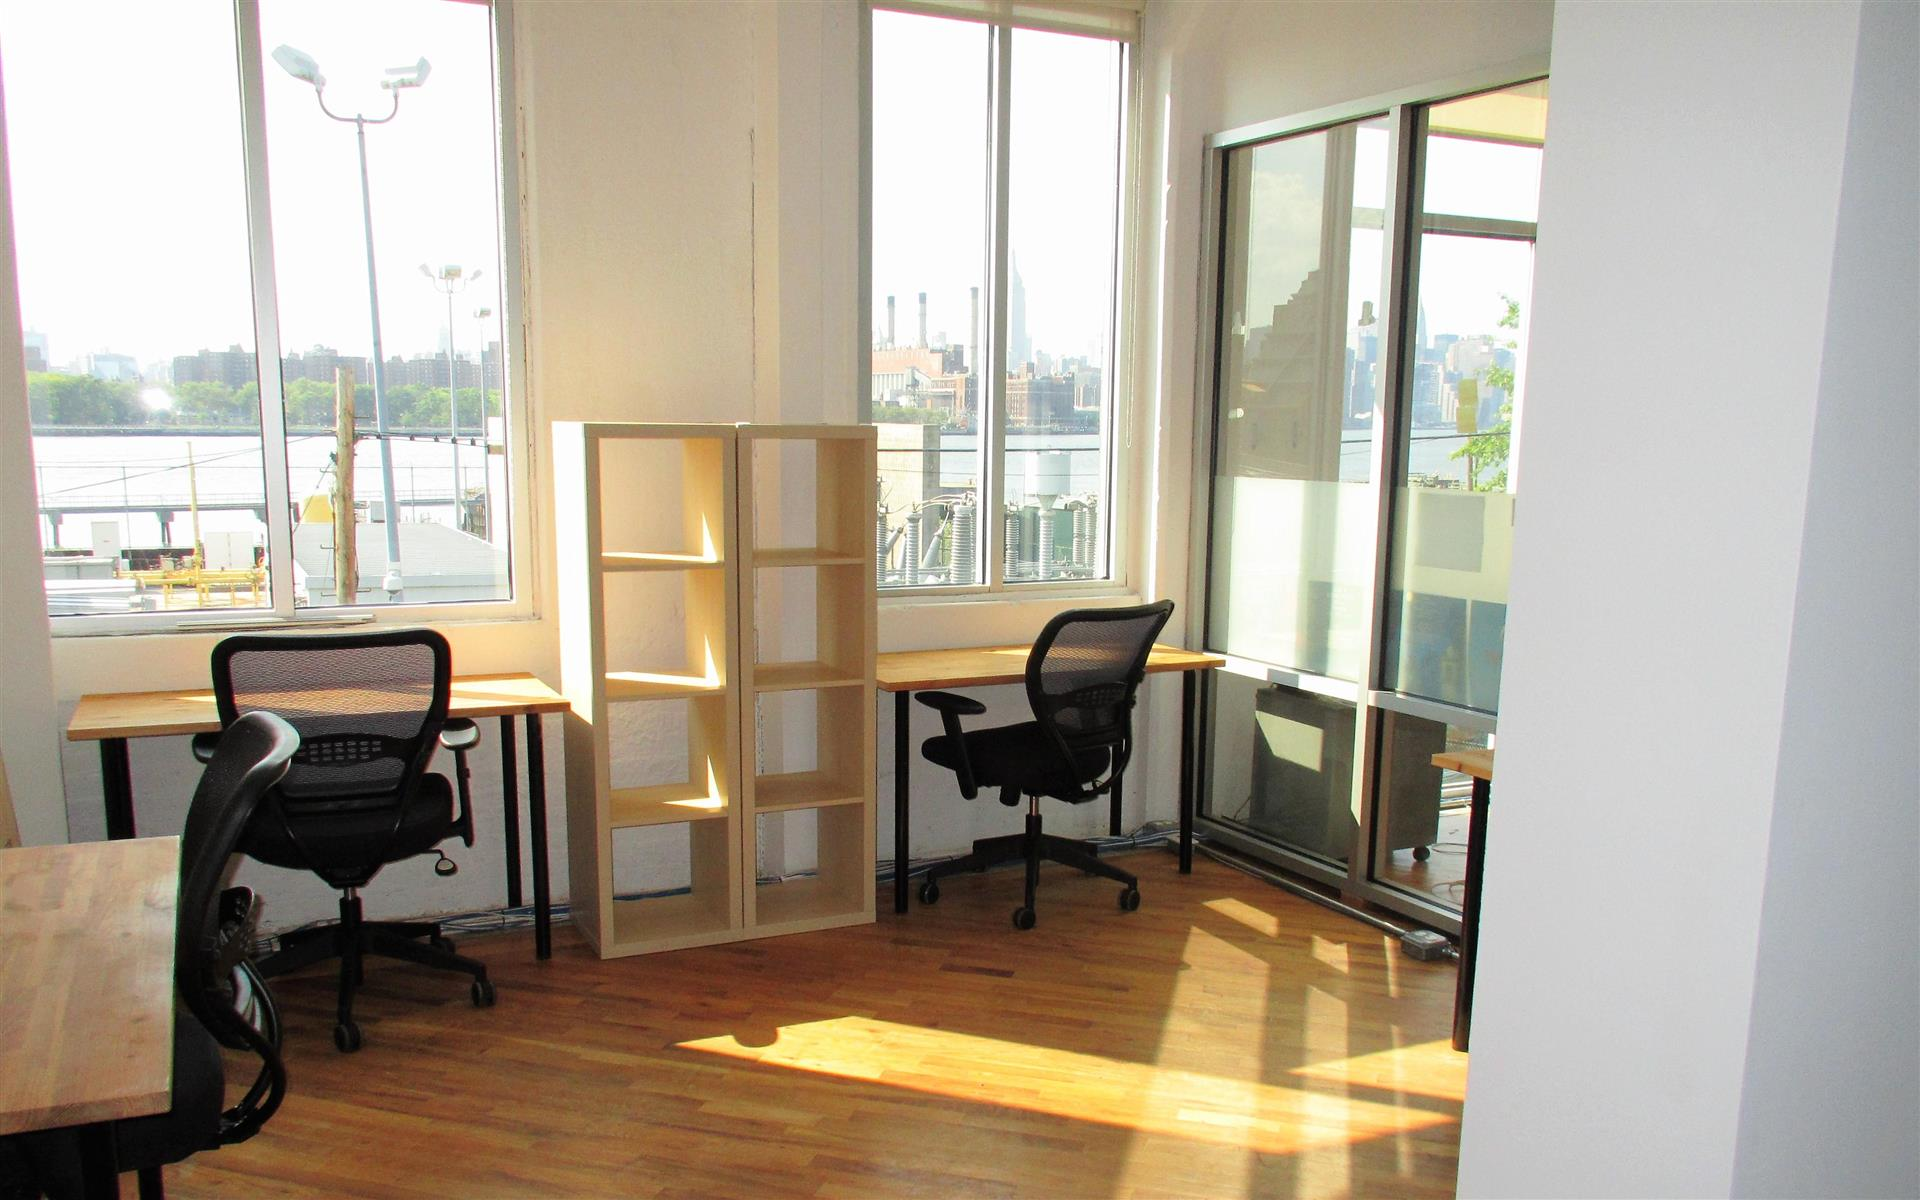 Green Desk - 240 Kent Ave - 4 Desk Office with Natural Lighting